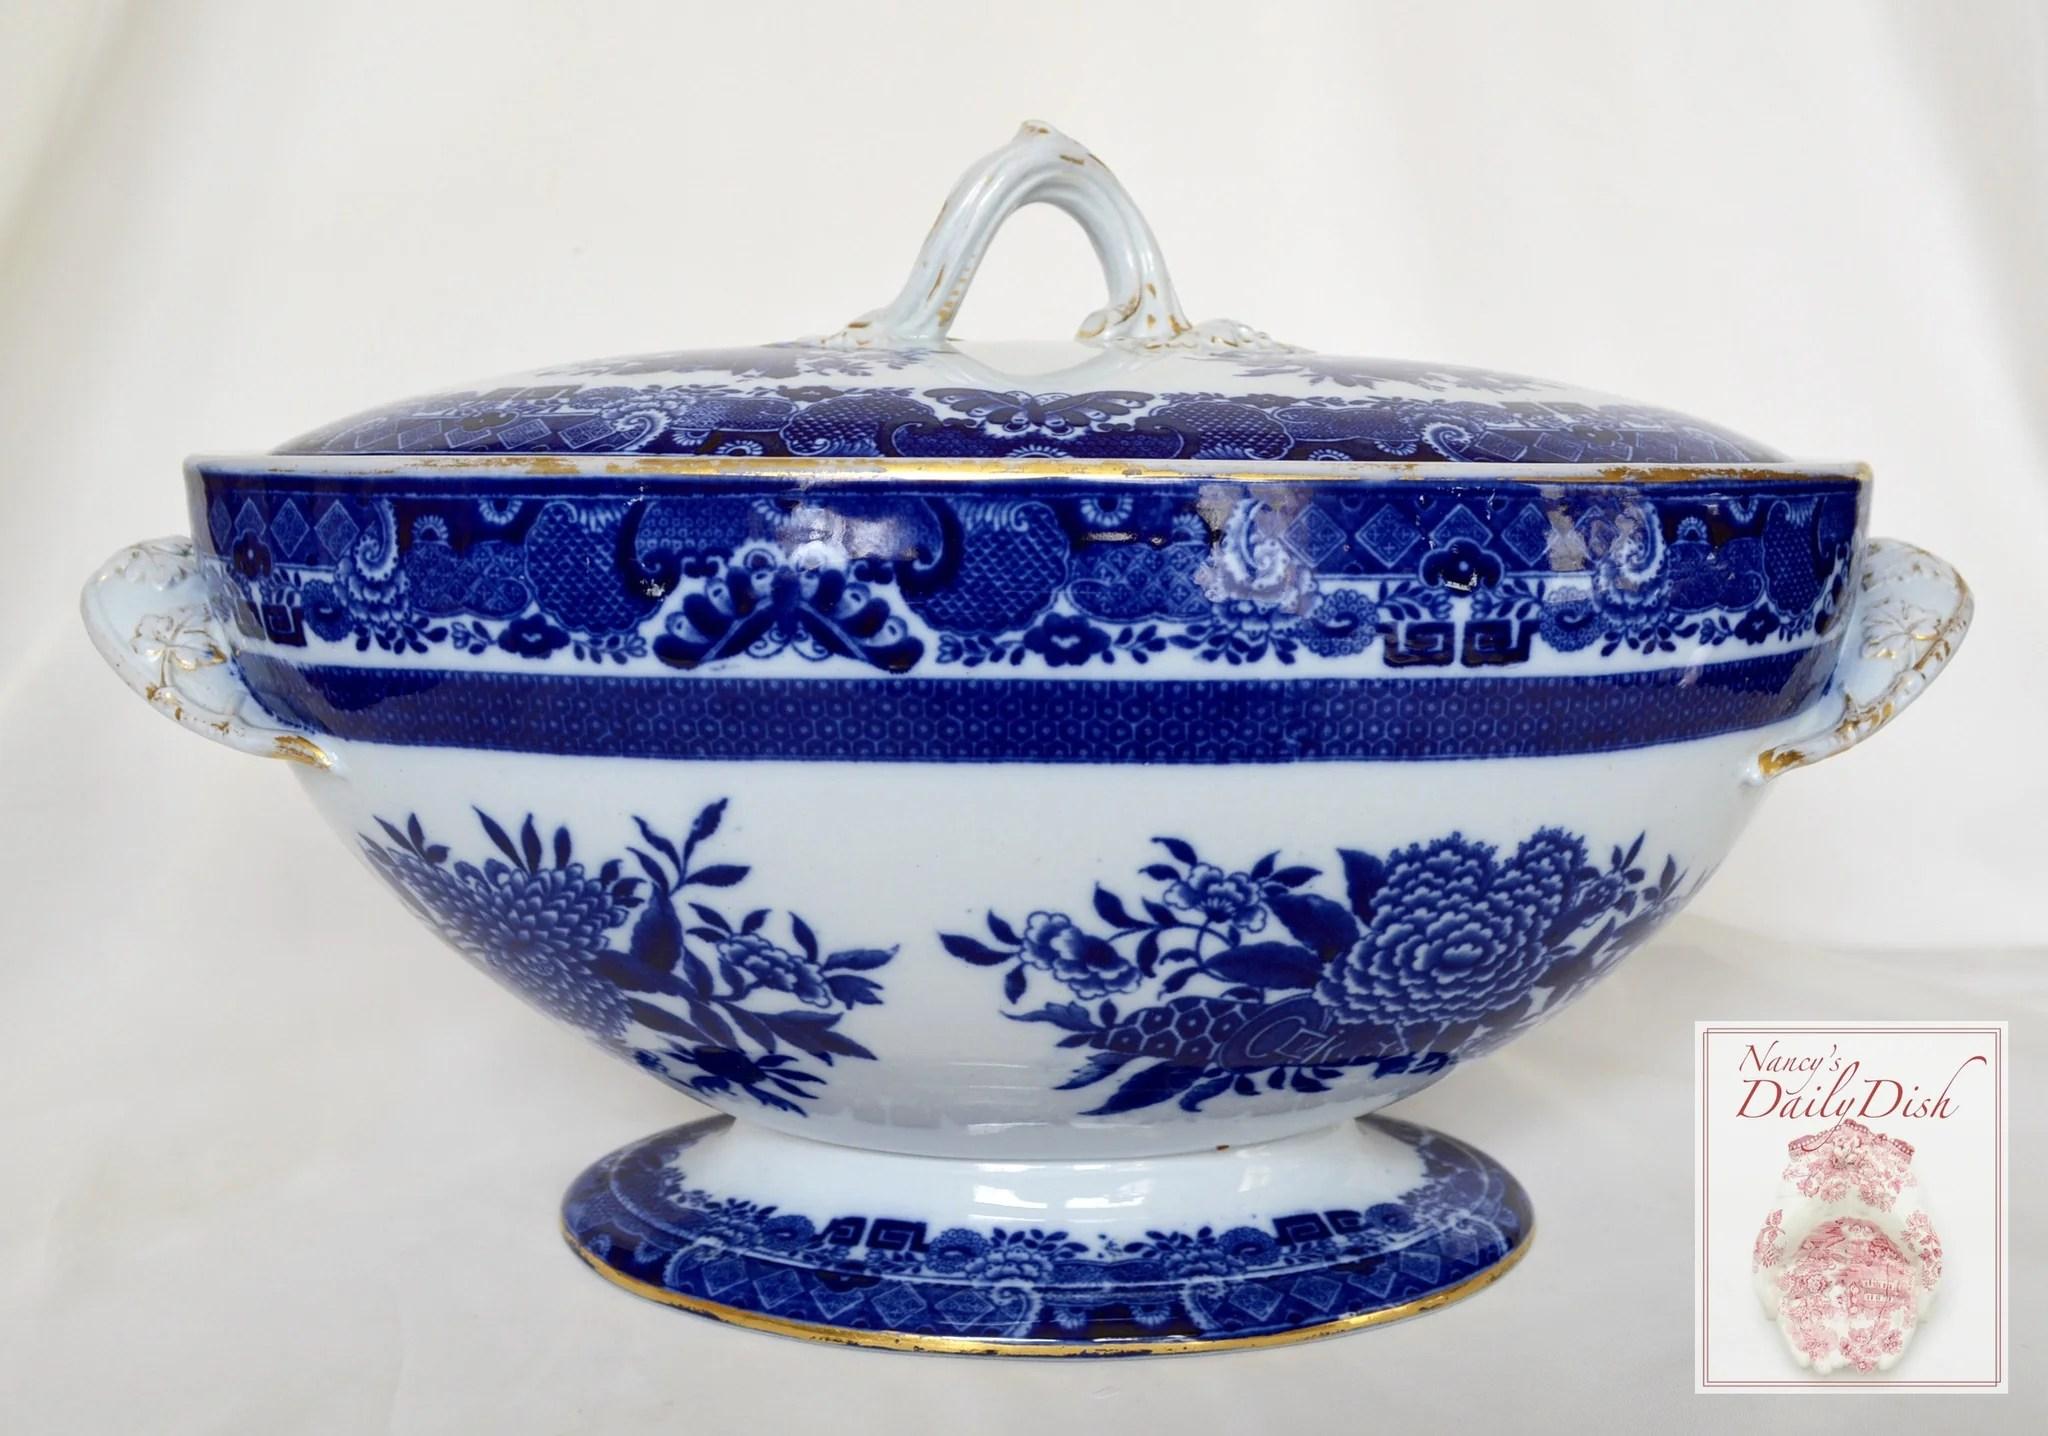 Antique Flow Blue Chinoiserie Copeland Spode Transferware